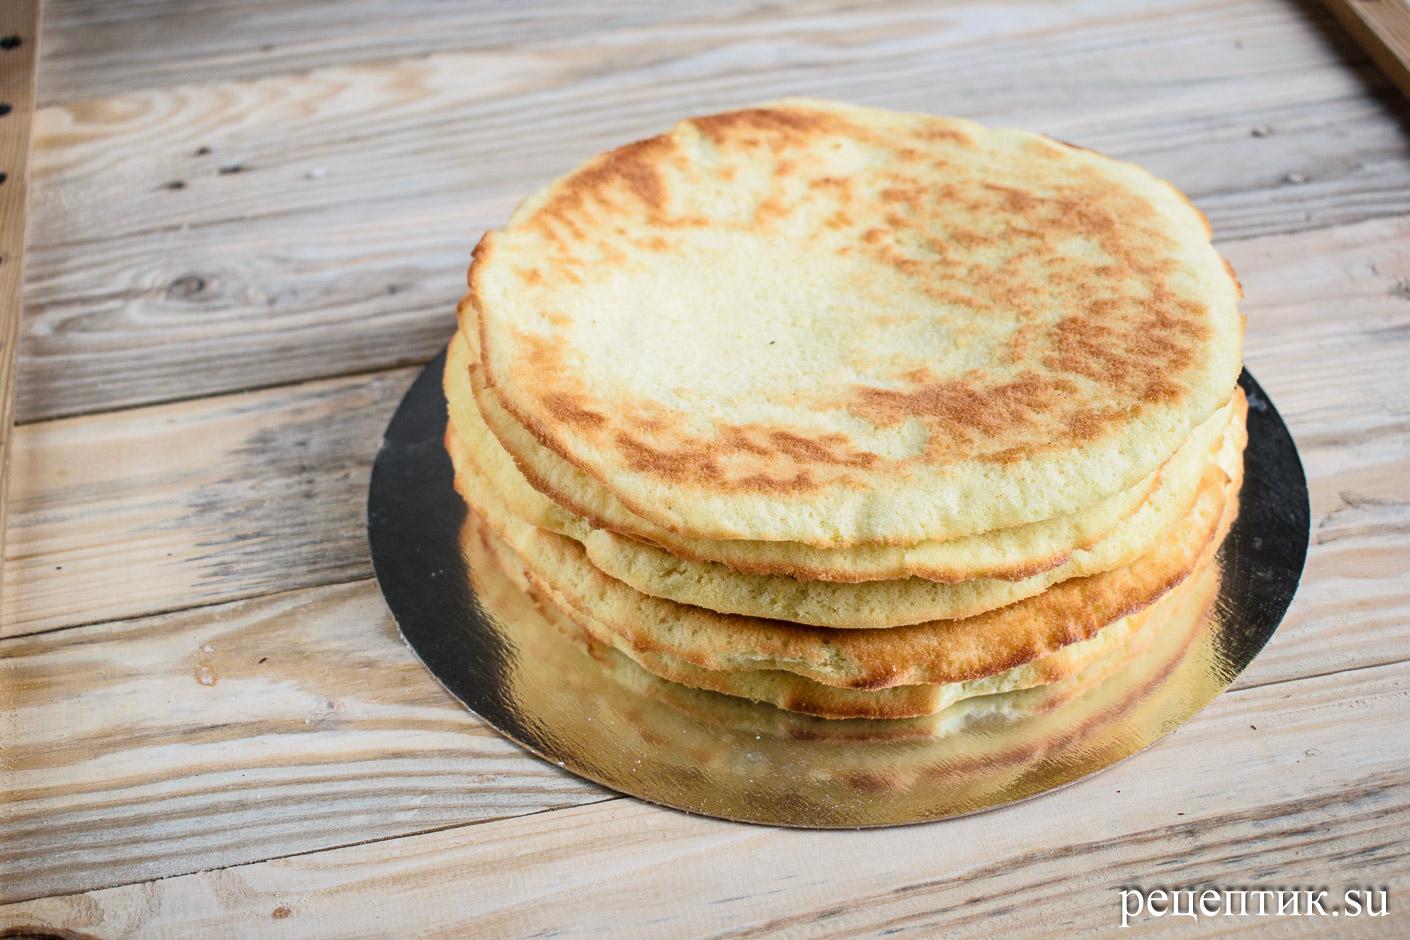 Торт «Добош» - рецепт с фото, шаг 10